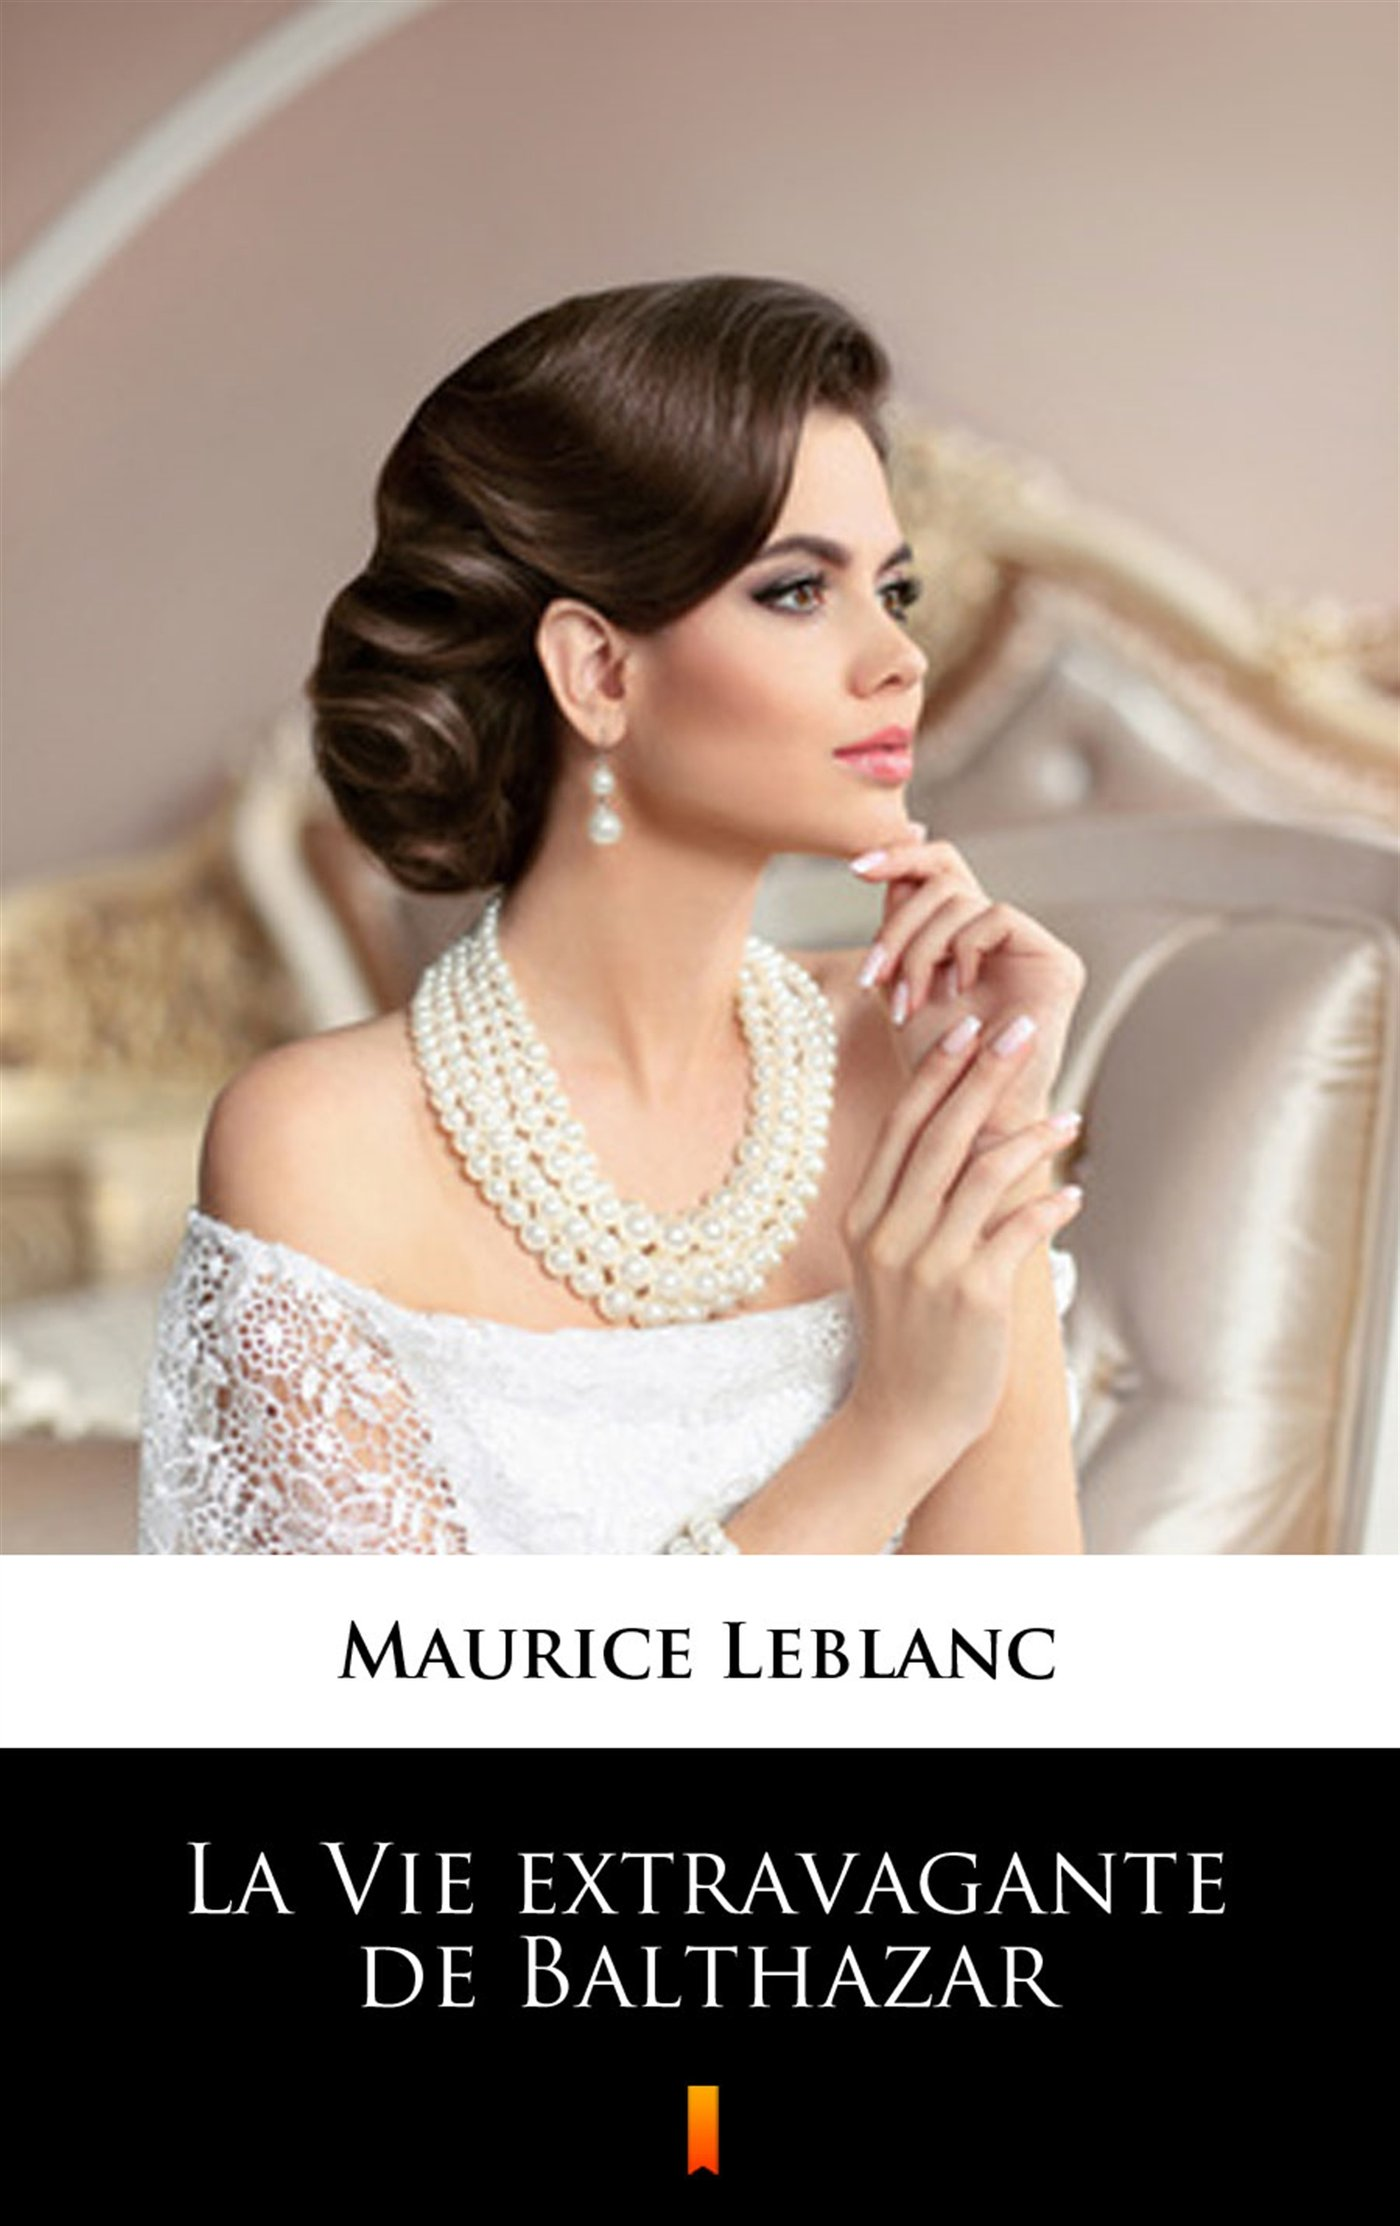 La Vie extravagante de Balthazar - Ebook (Książka EPUB) do pobrania w formacie EPUB